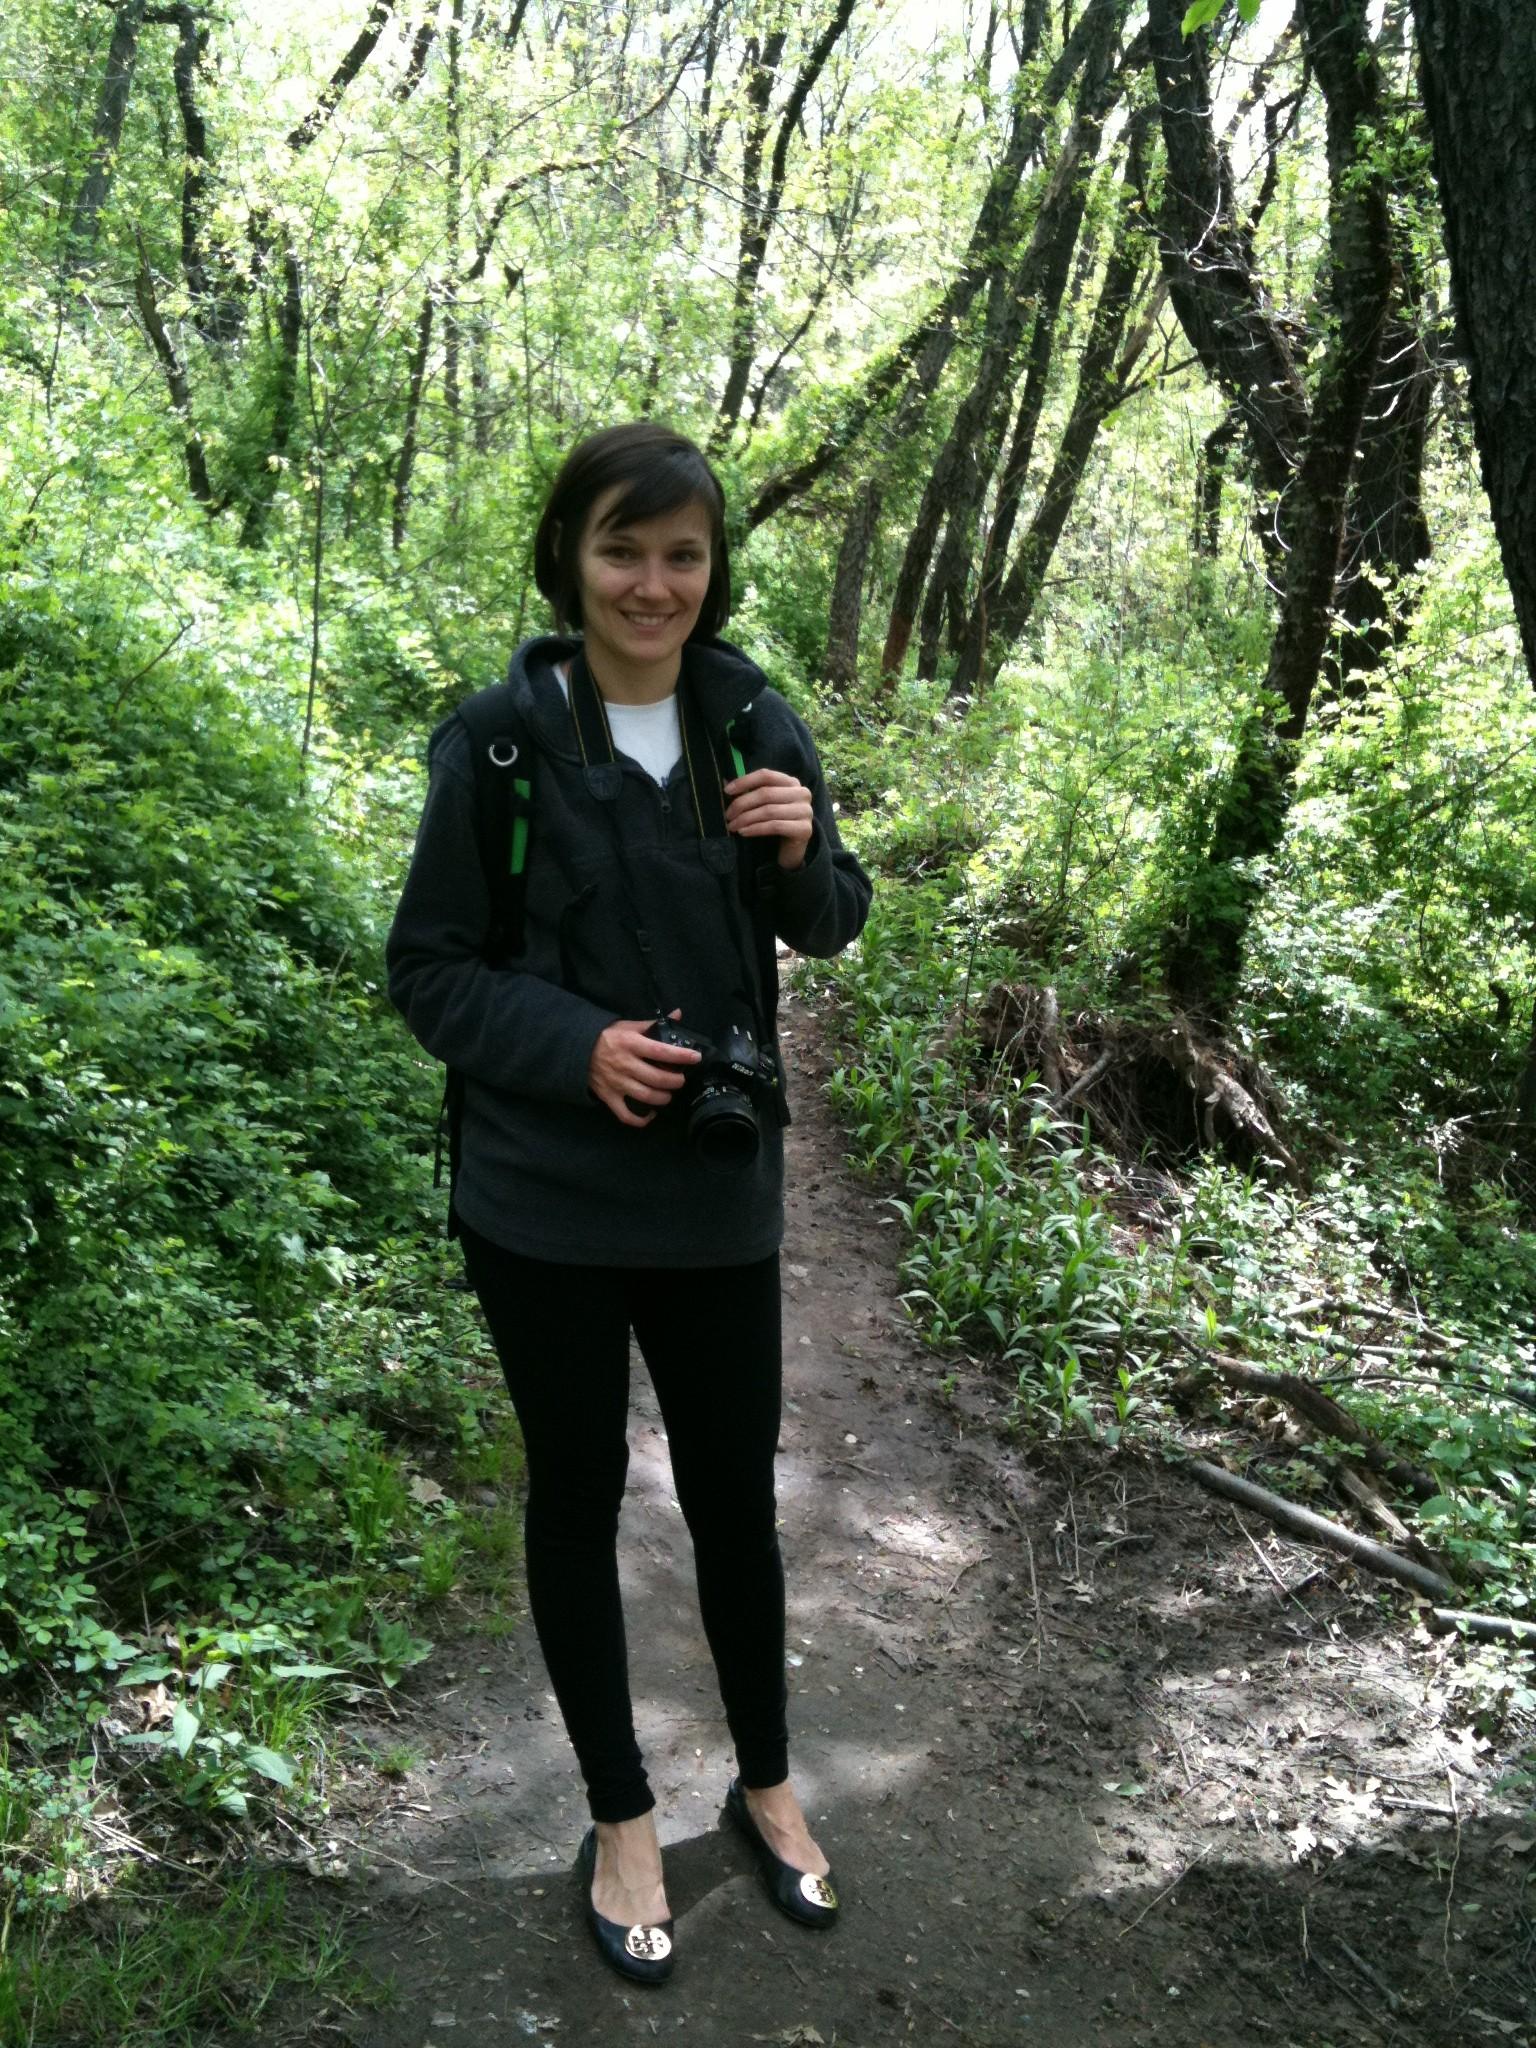 Amanda on a hike